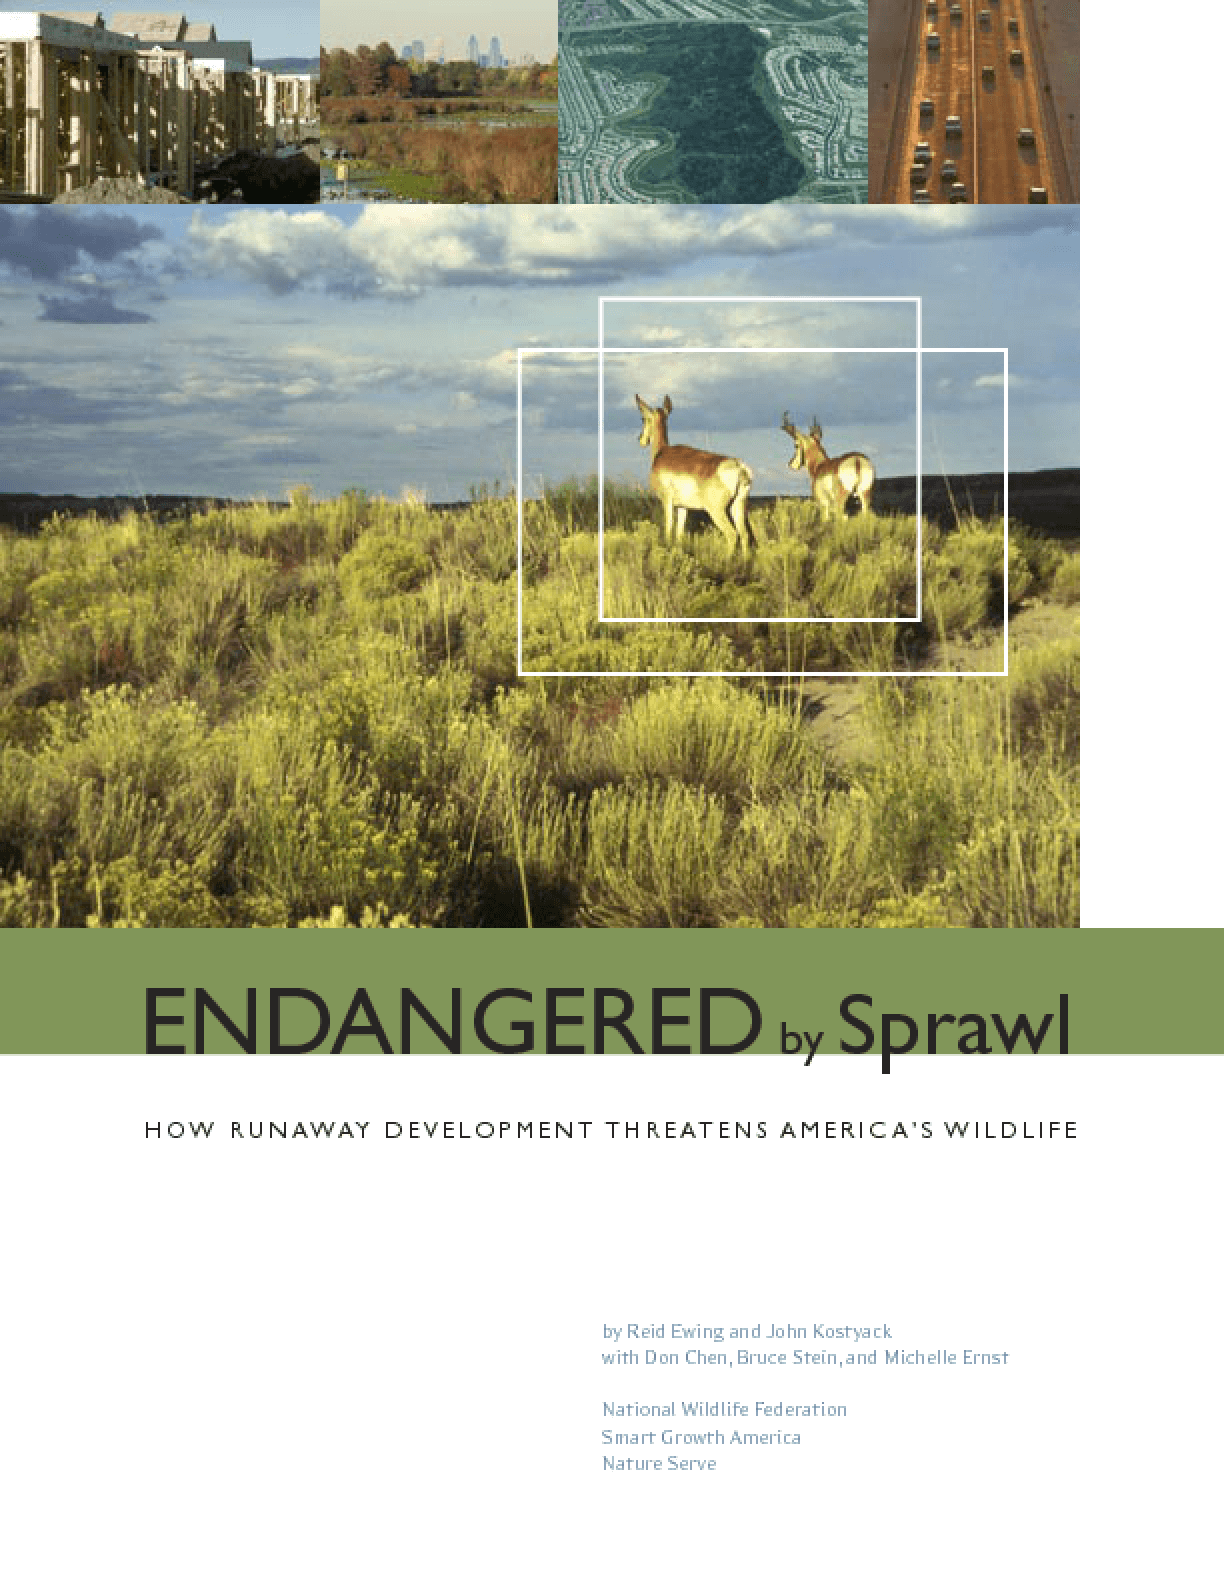 Endangered by Sprawl: How Runaway Development Threatens America's Wildlife